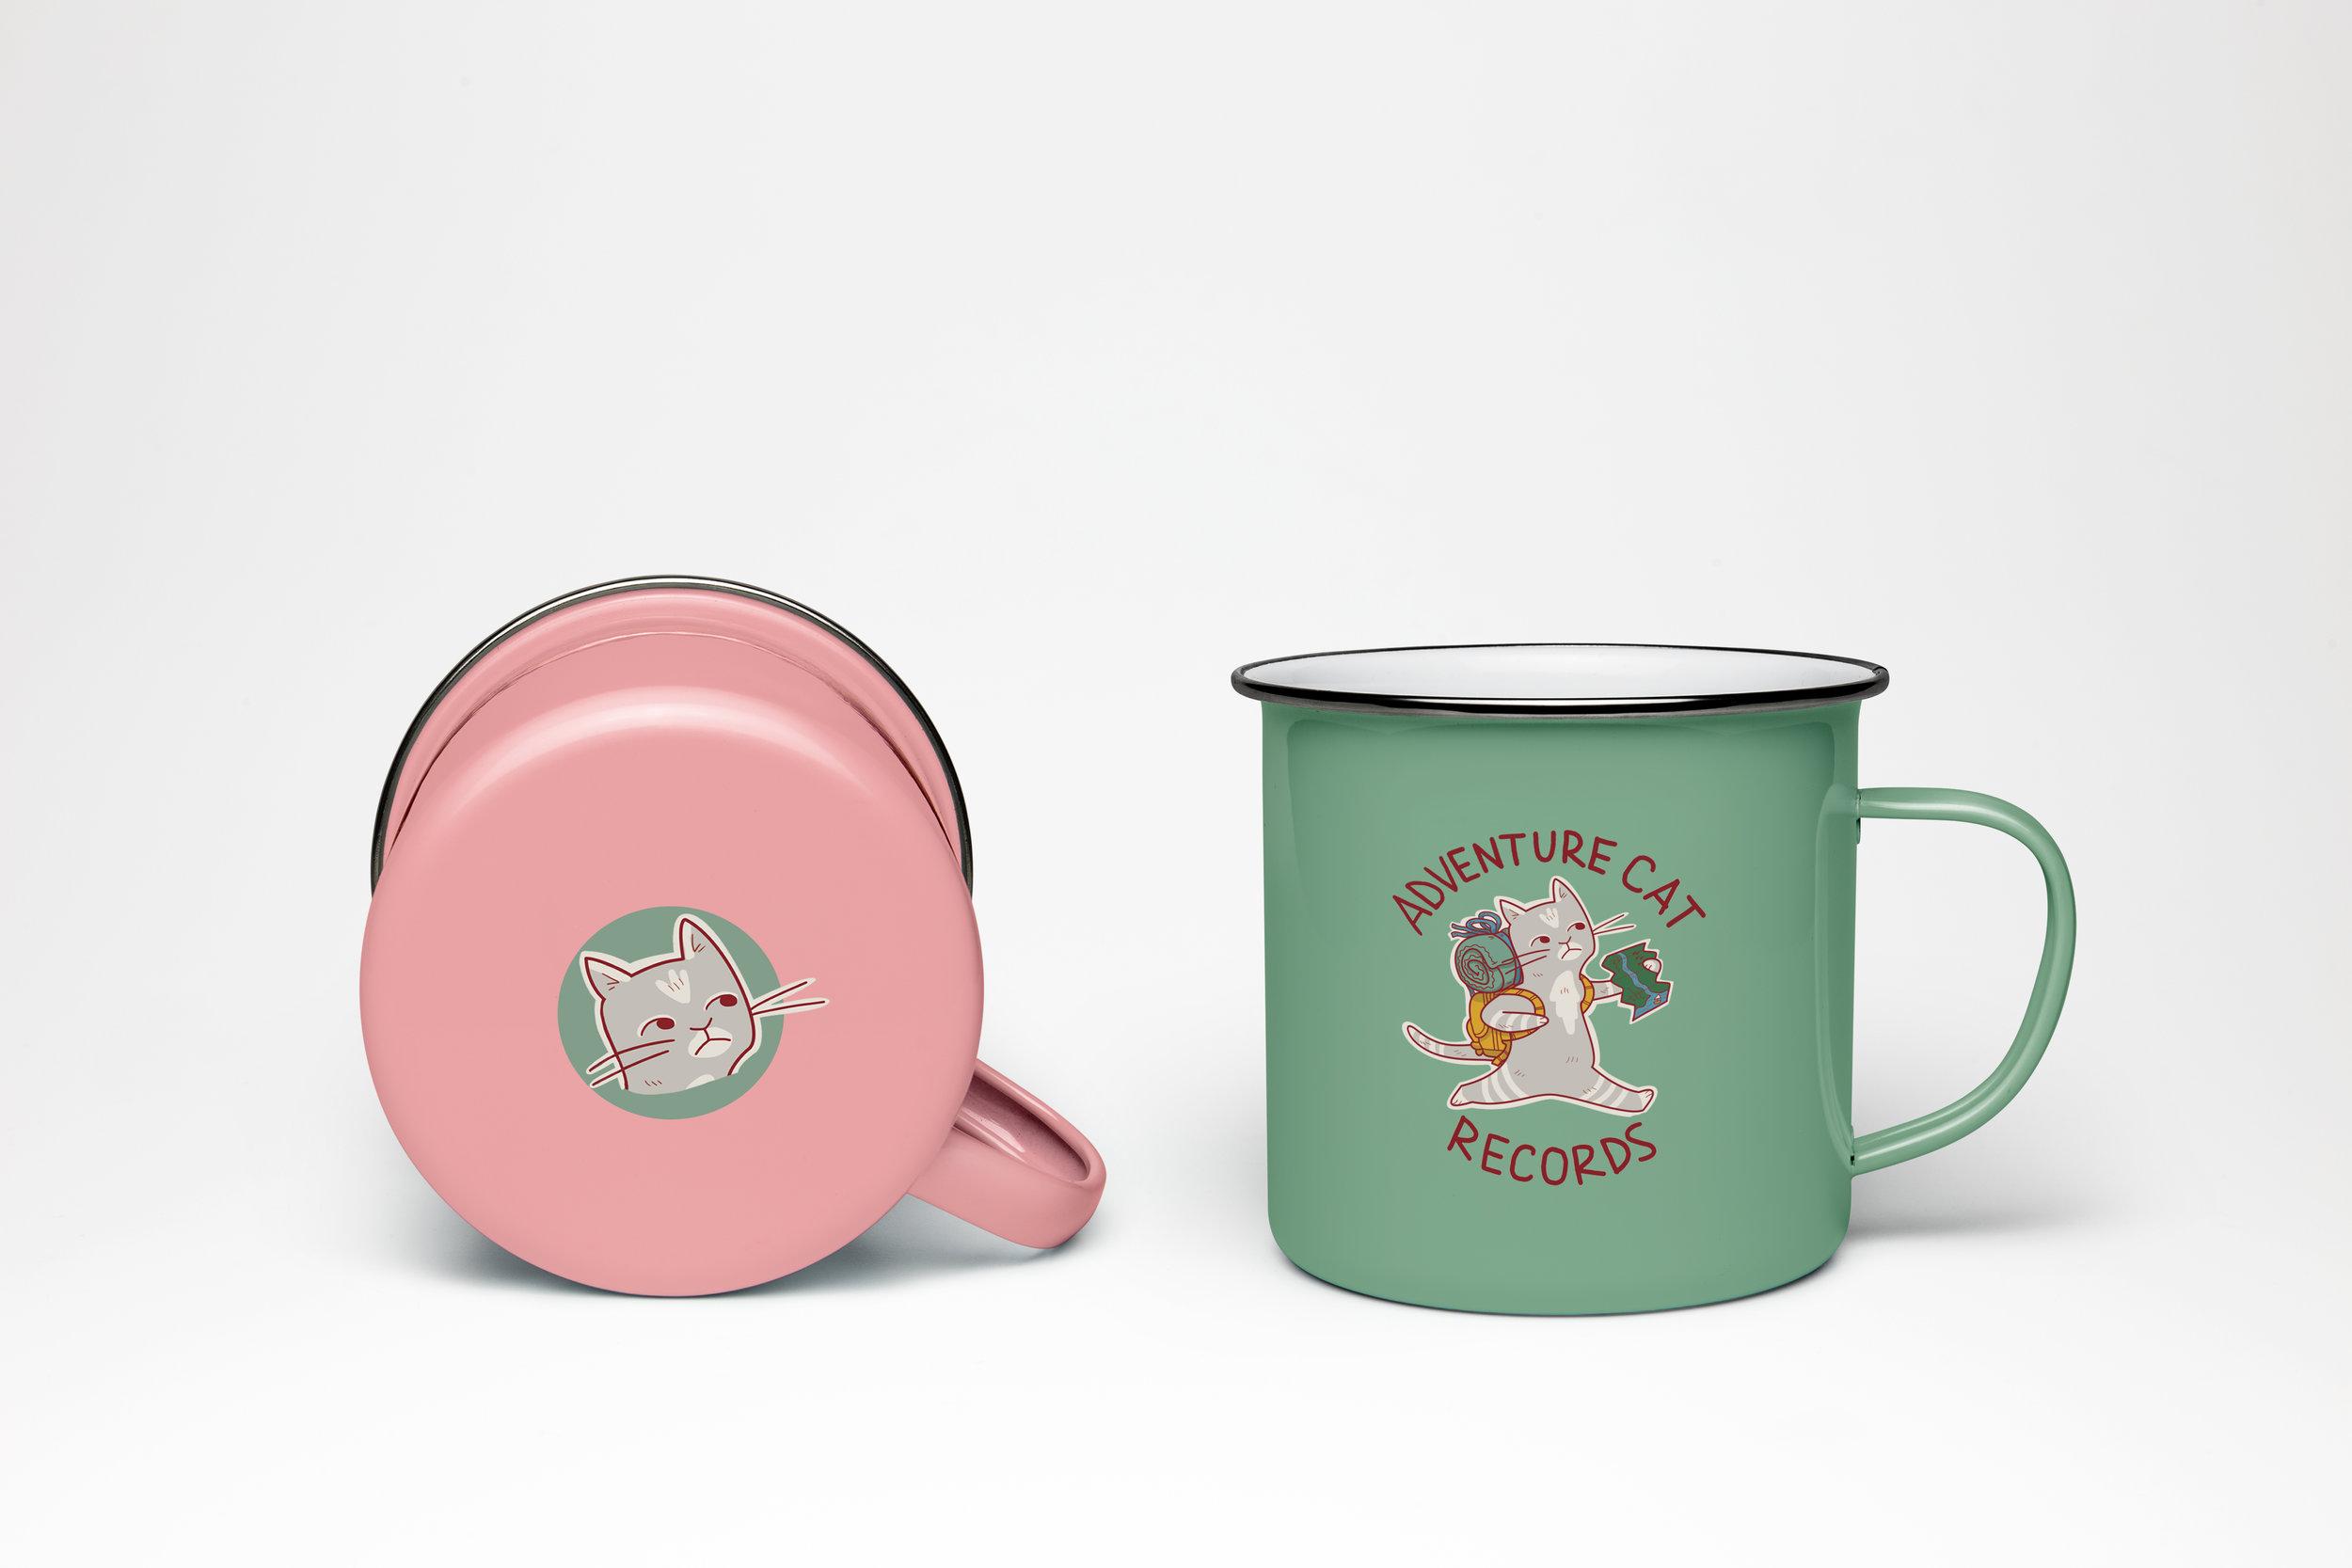 mug concept for Adventure Cat Records